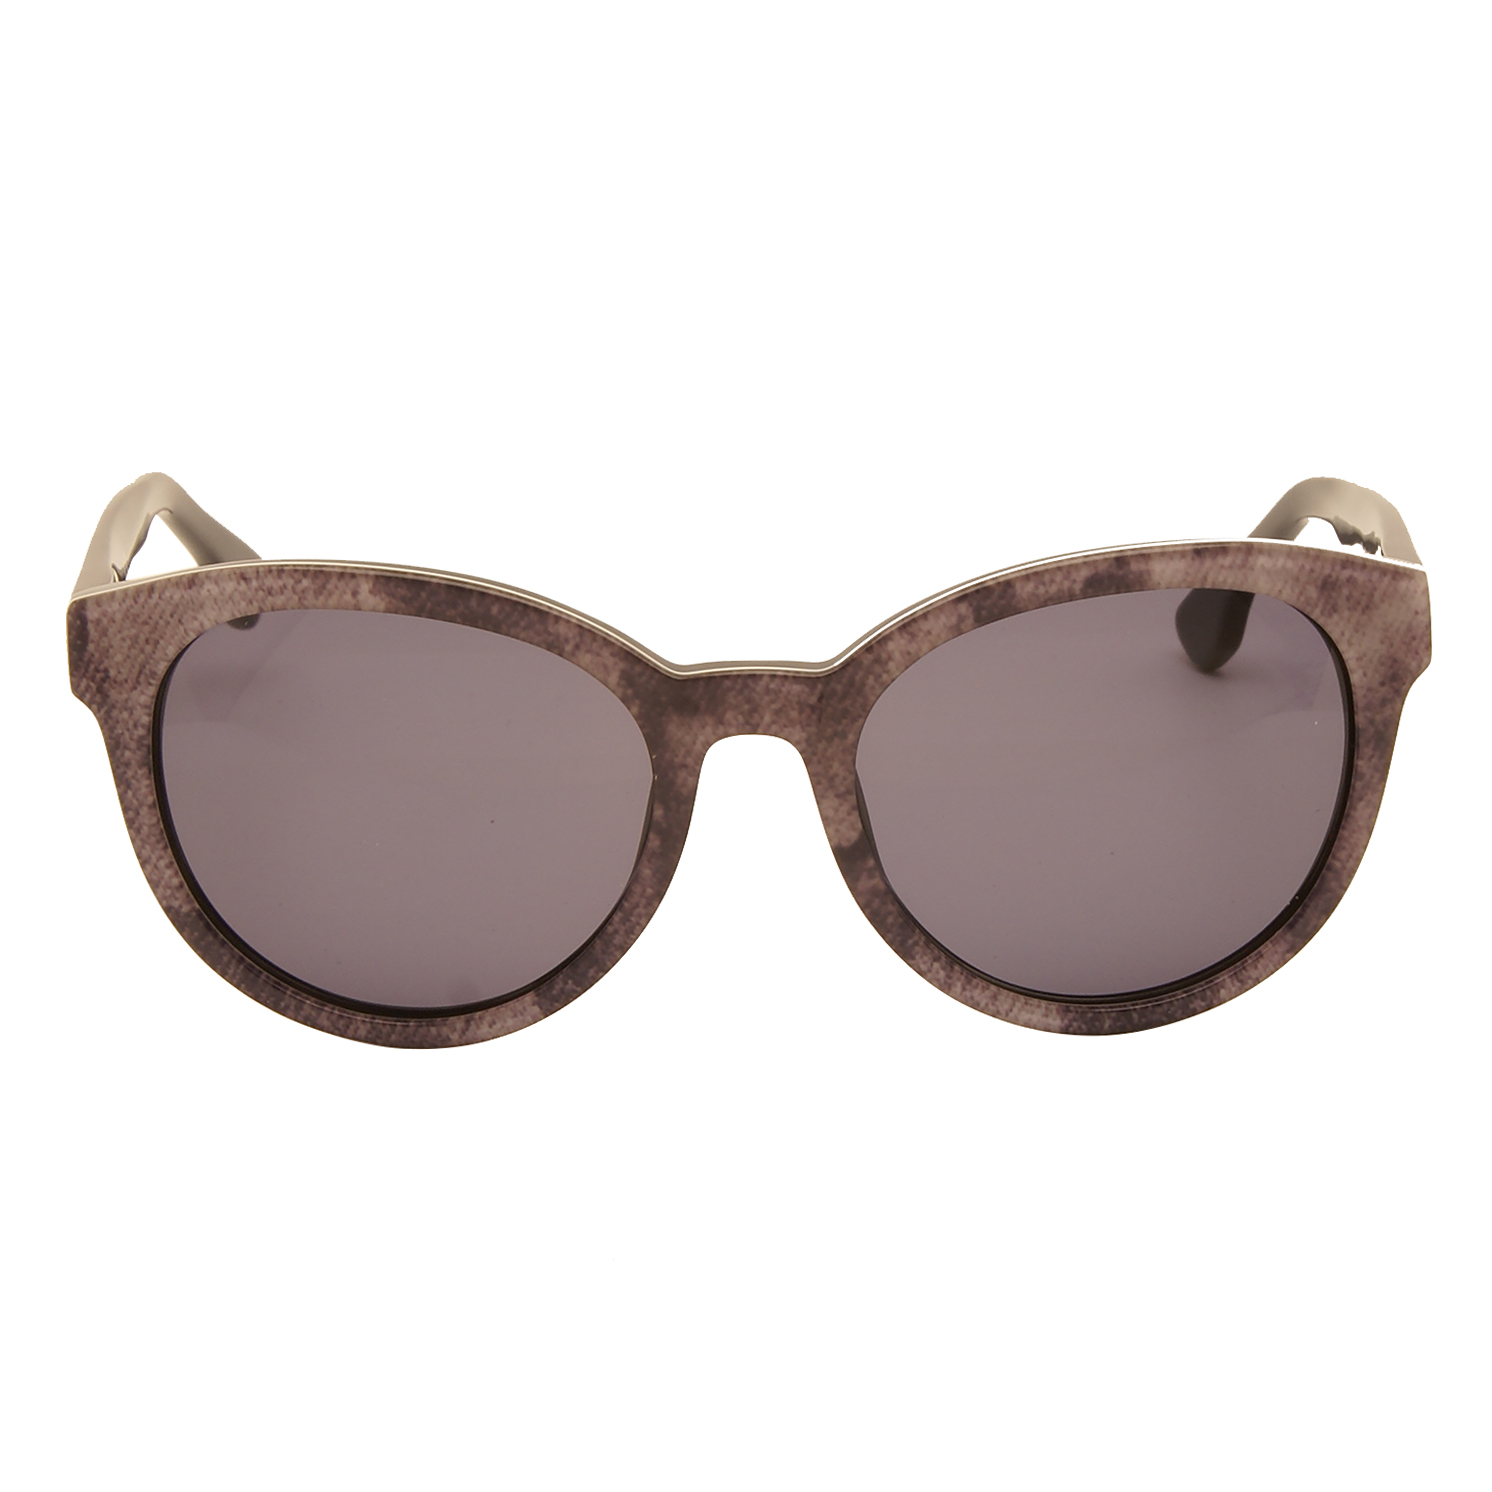 Diesel – Purple Cat Eye Style Sunglasses with Case